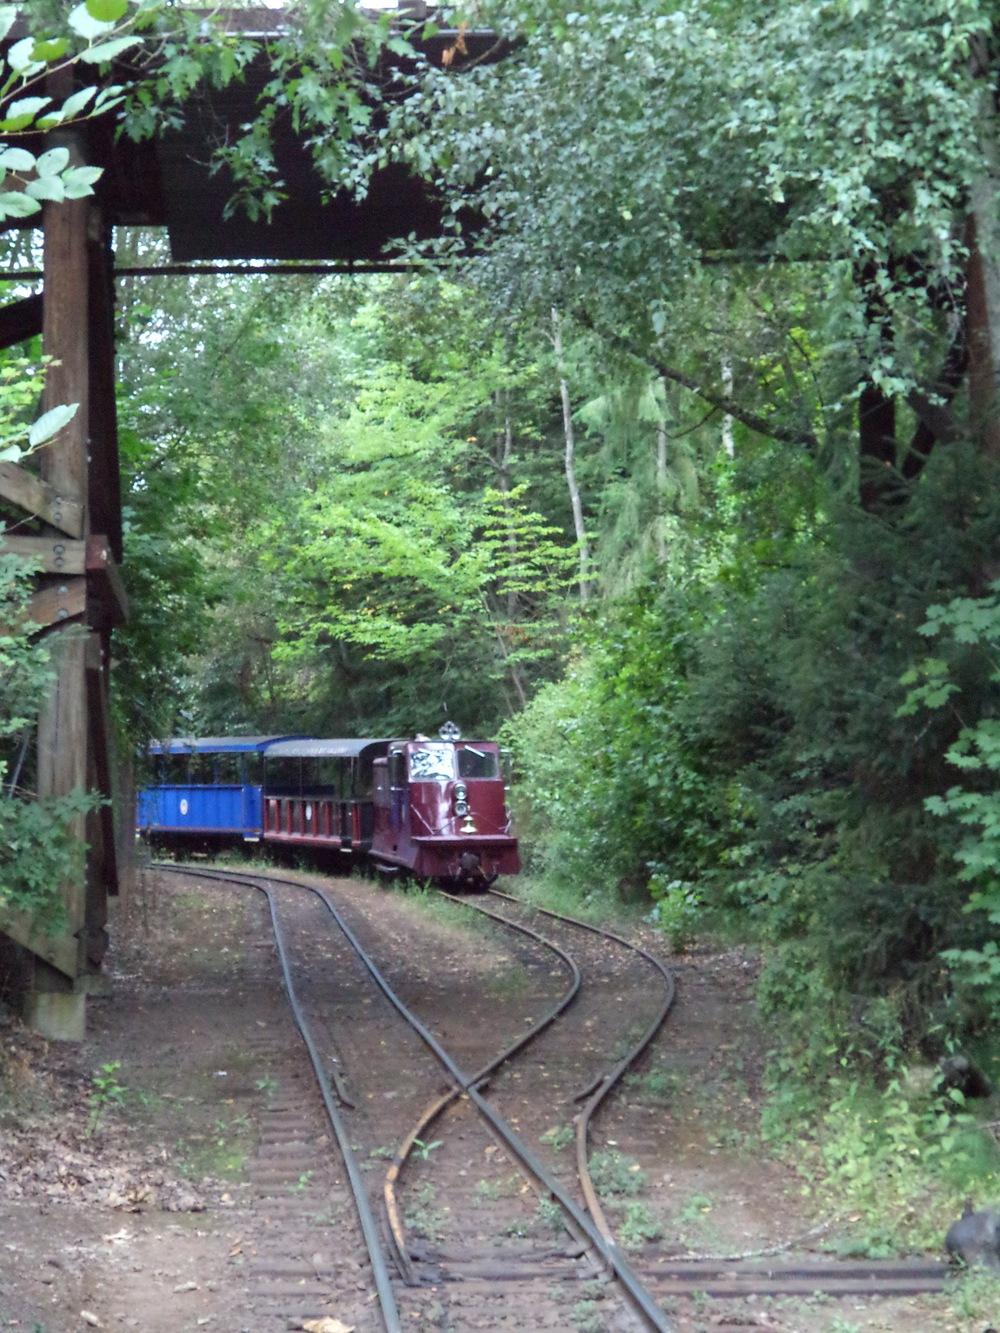 The Oregon Zoo train